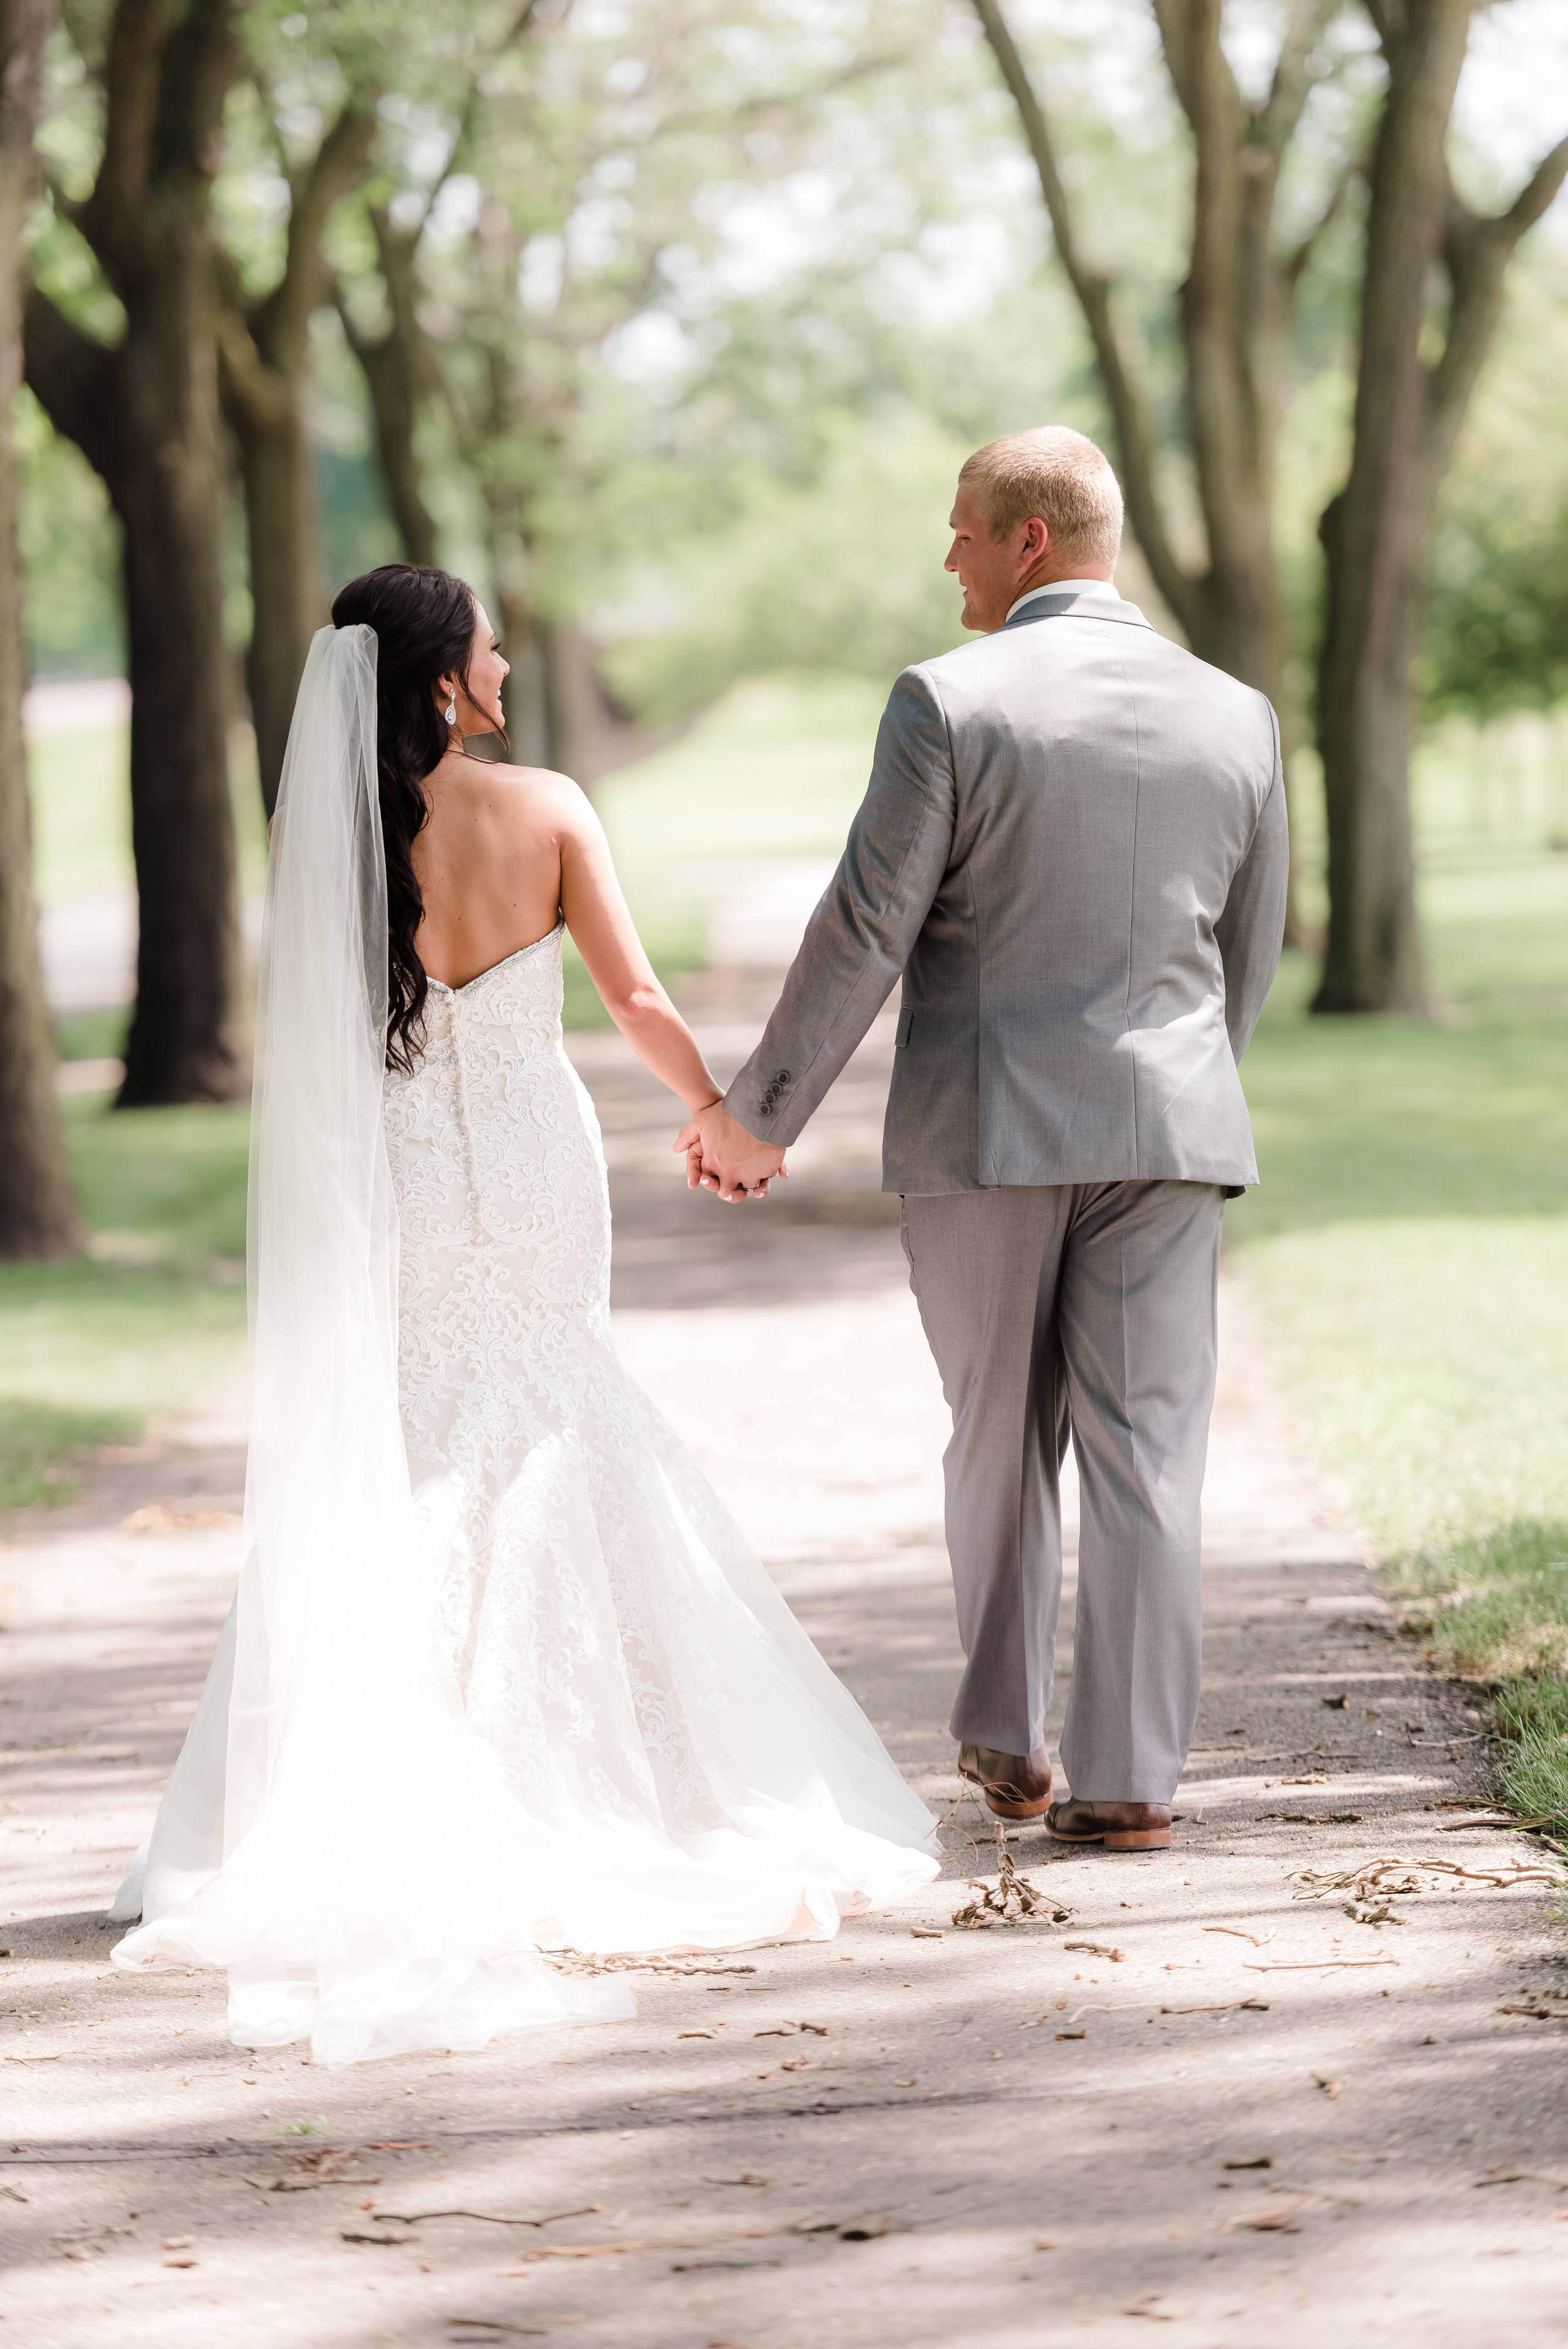 Layce and Brandon - Wedding - Outdoor Portraits-81.jpg